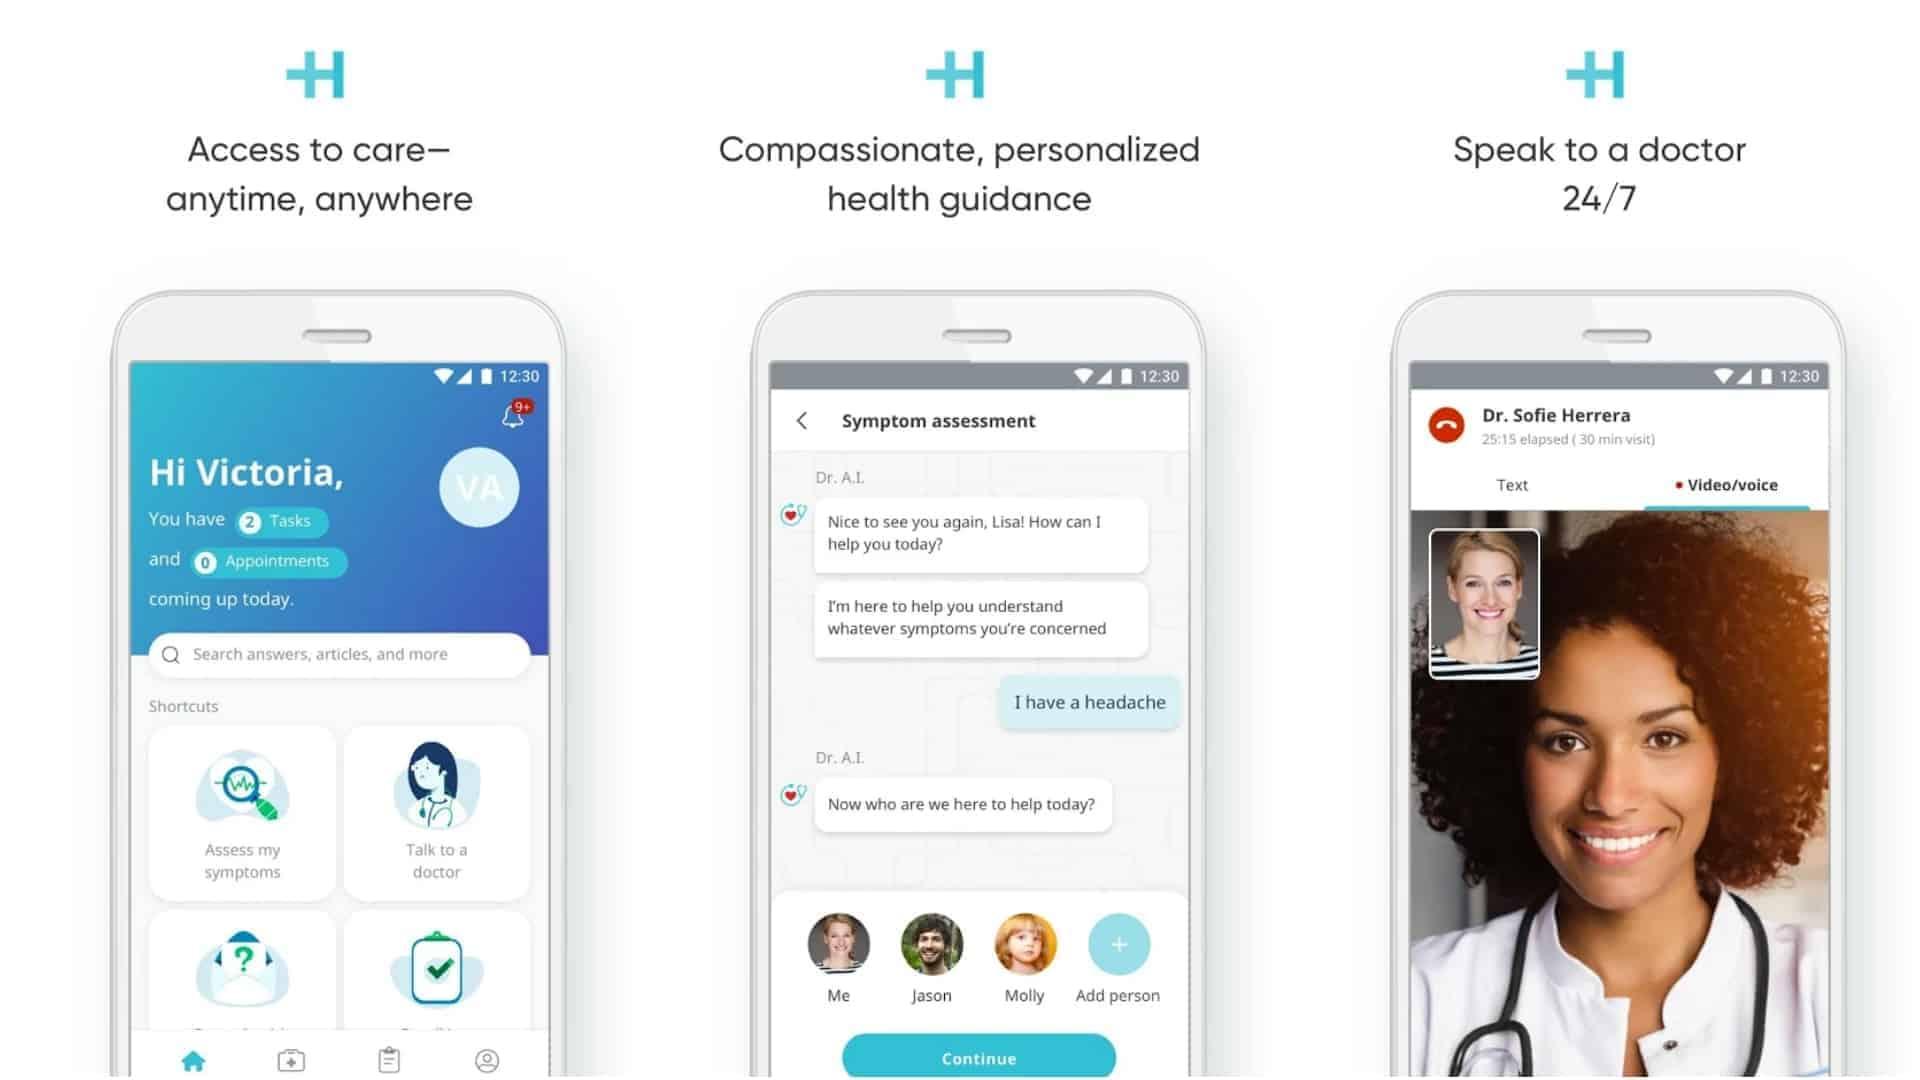 HealthTap app image March 2020